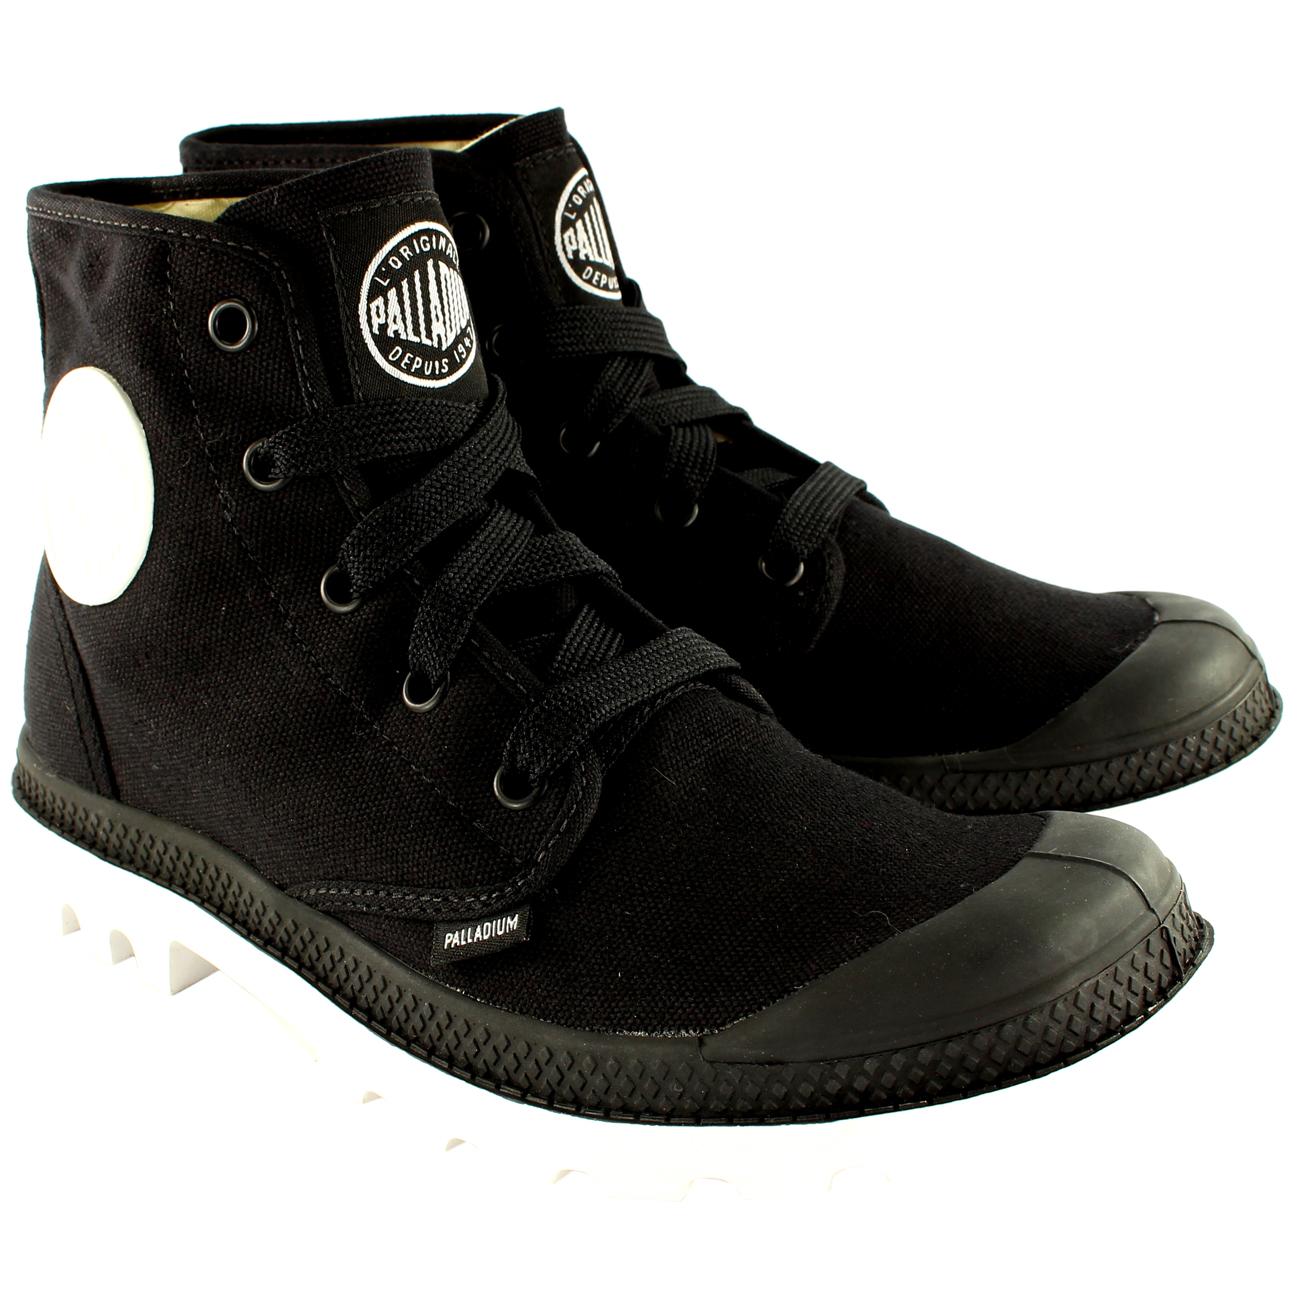 Palladium Blanc Boot Trainers